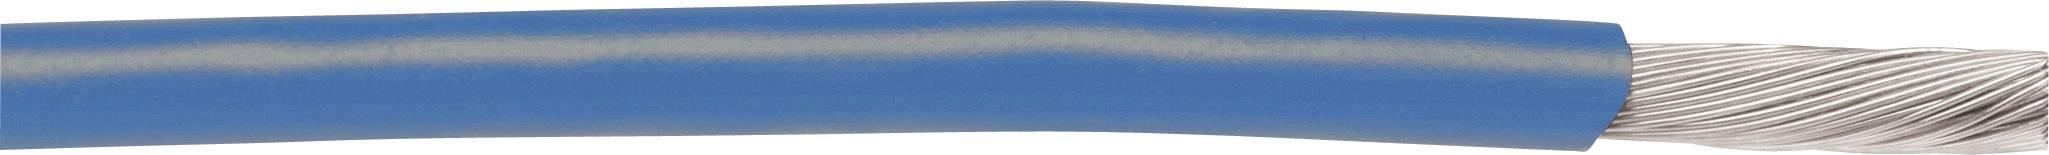 Pletenica EcoWire 1 x 1.31 mm, modra AlphaWire 6716 30.5 m